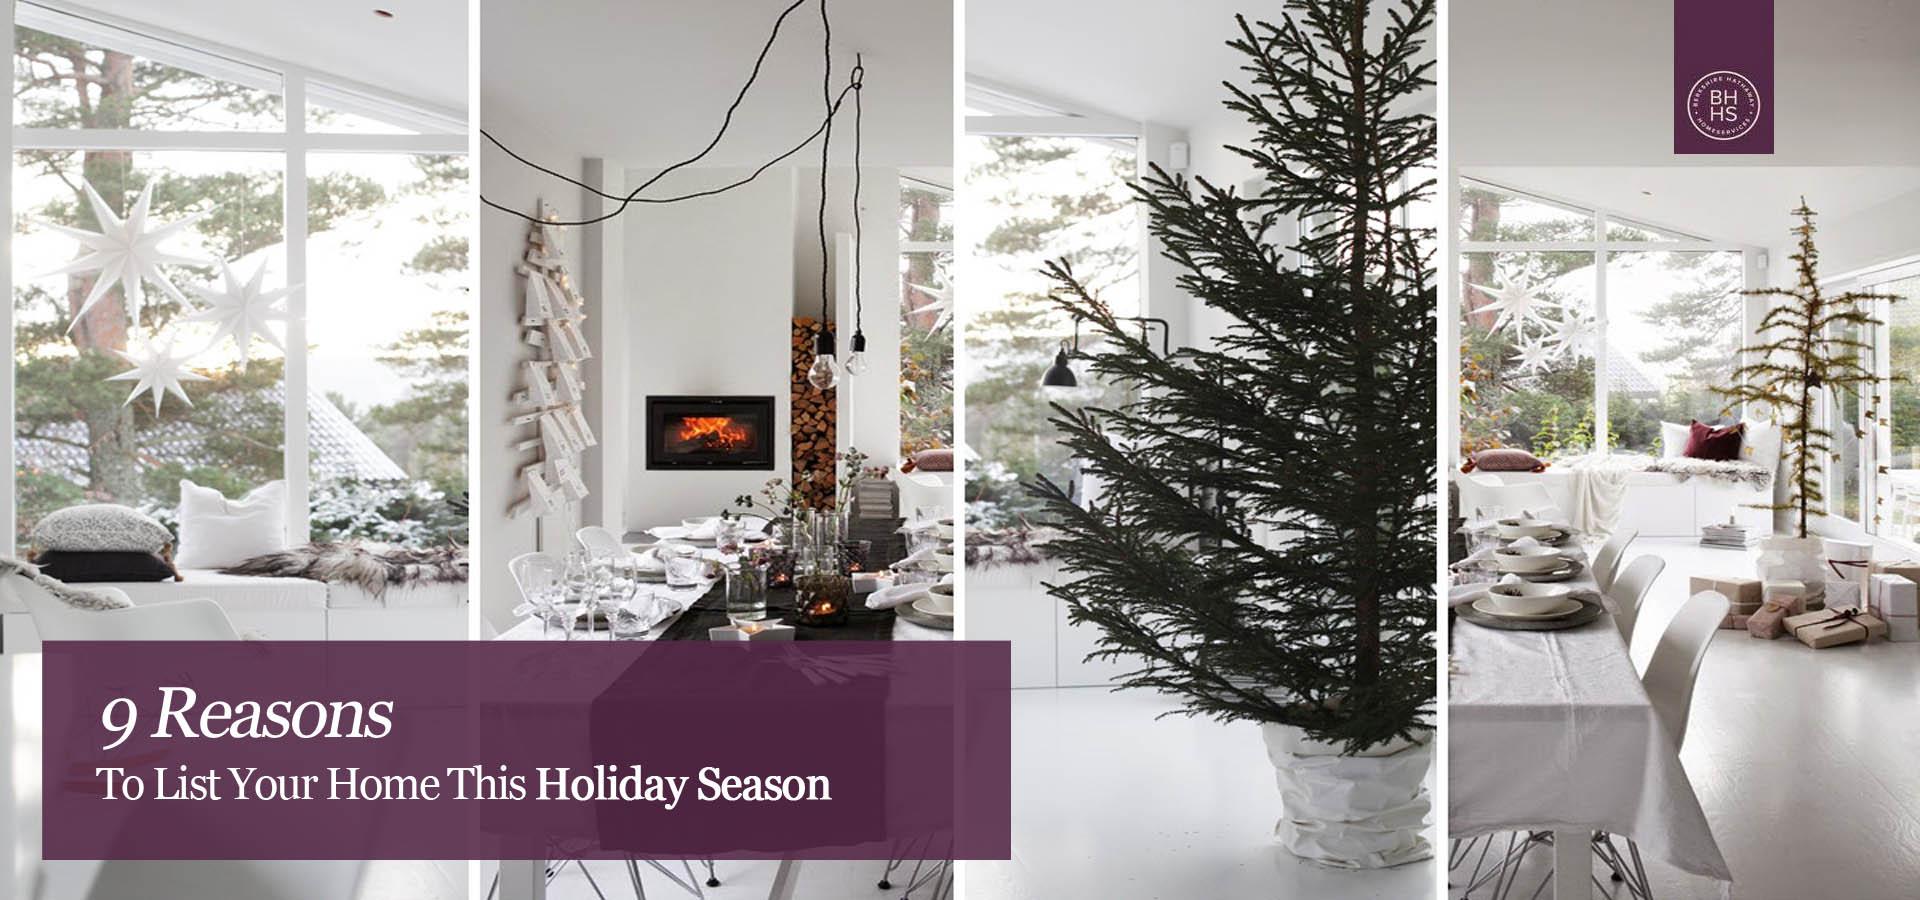 List Your Home This Holiday Season